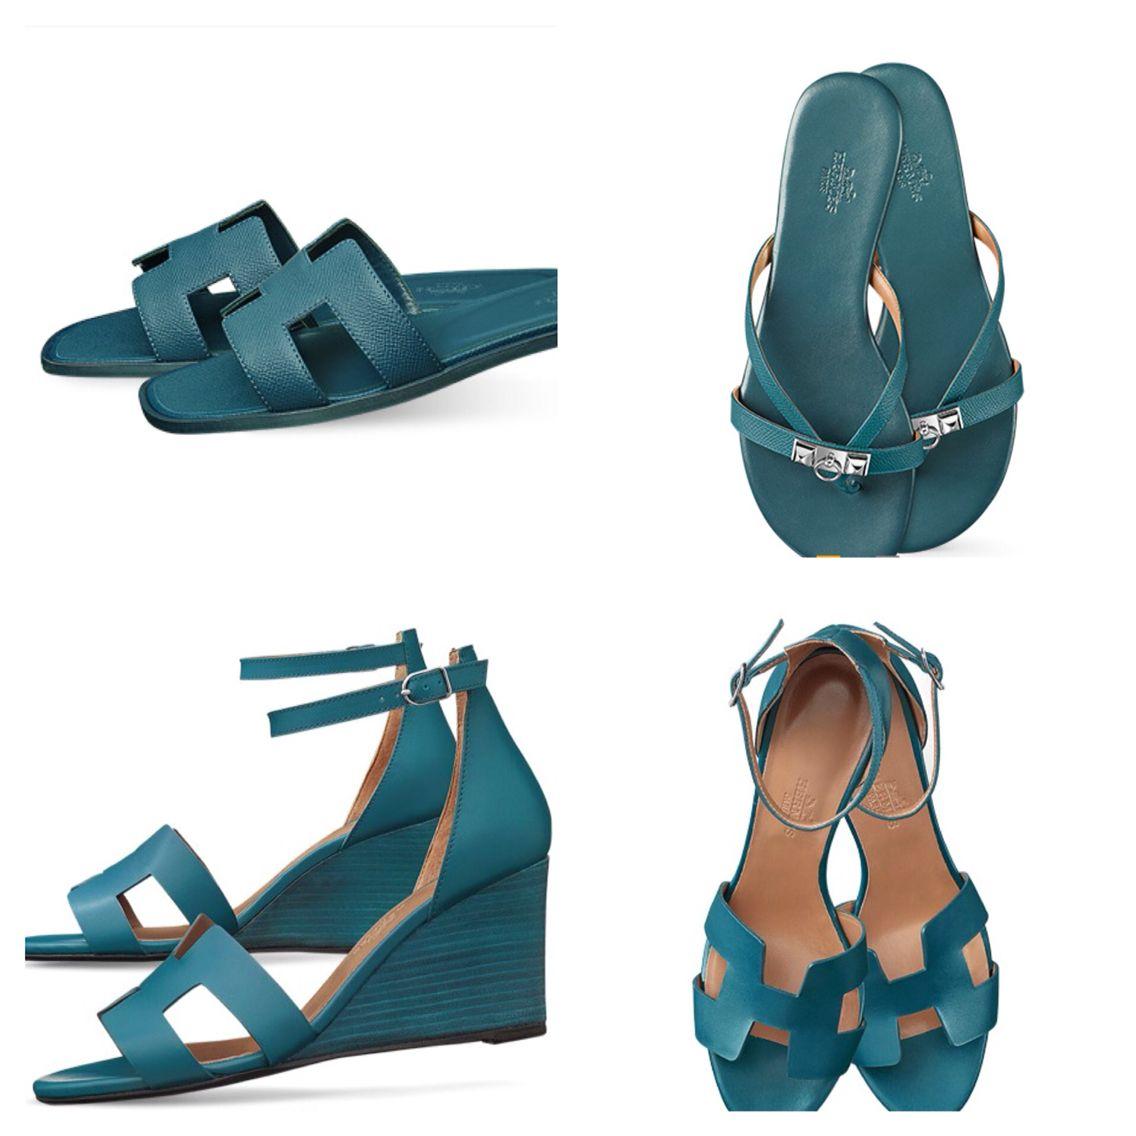 Hermes sandals dance shoes - Hermes In Beautiful Blue Oran Sandal Corfou Sandal Legend Wedge